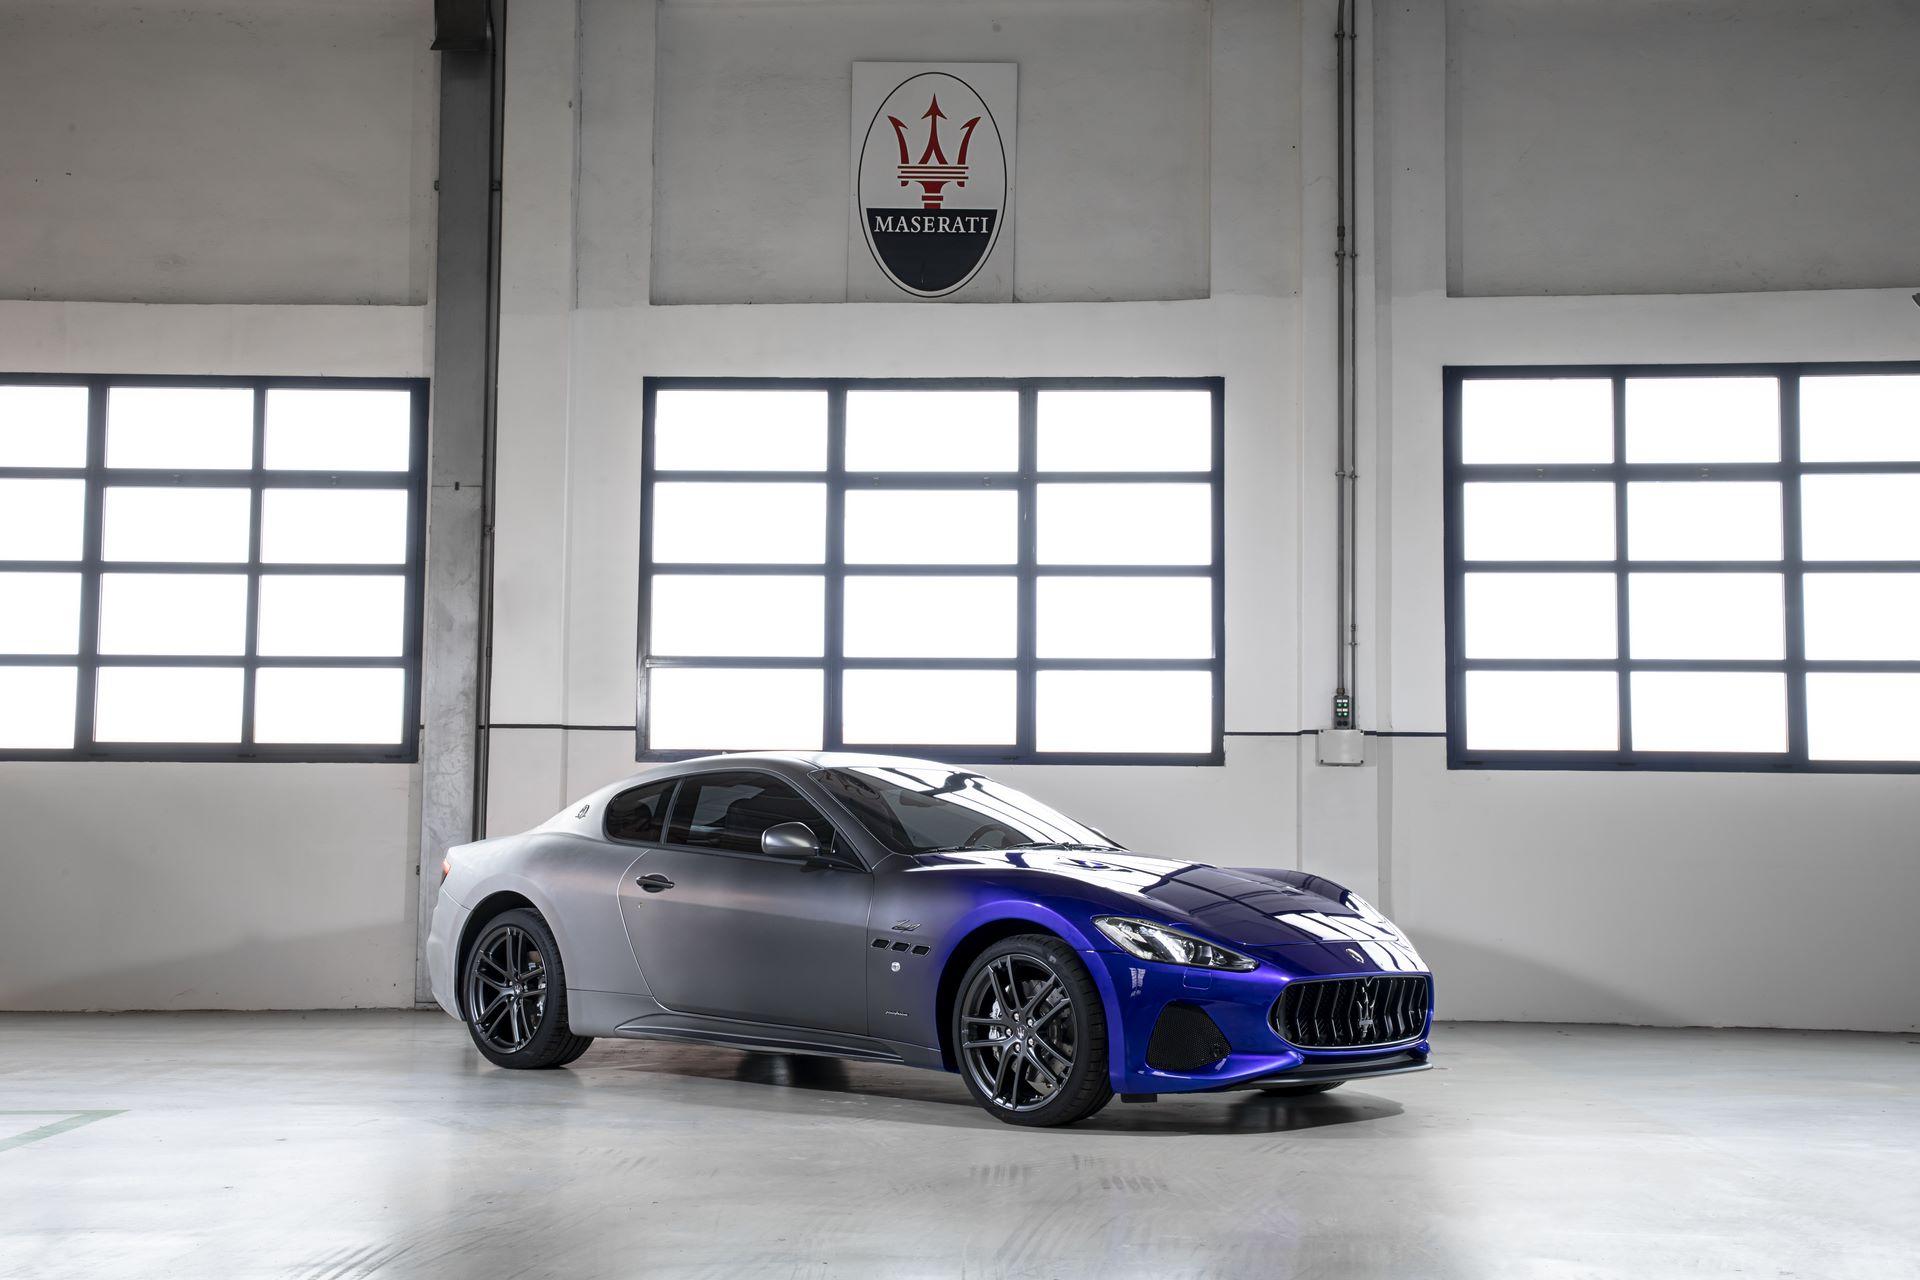 Maserati-GranTurismo-Zeda-4